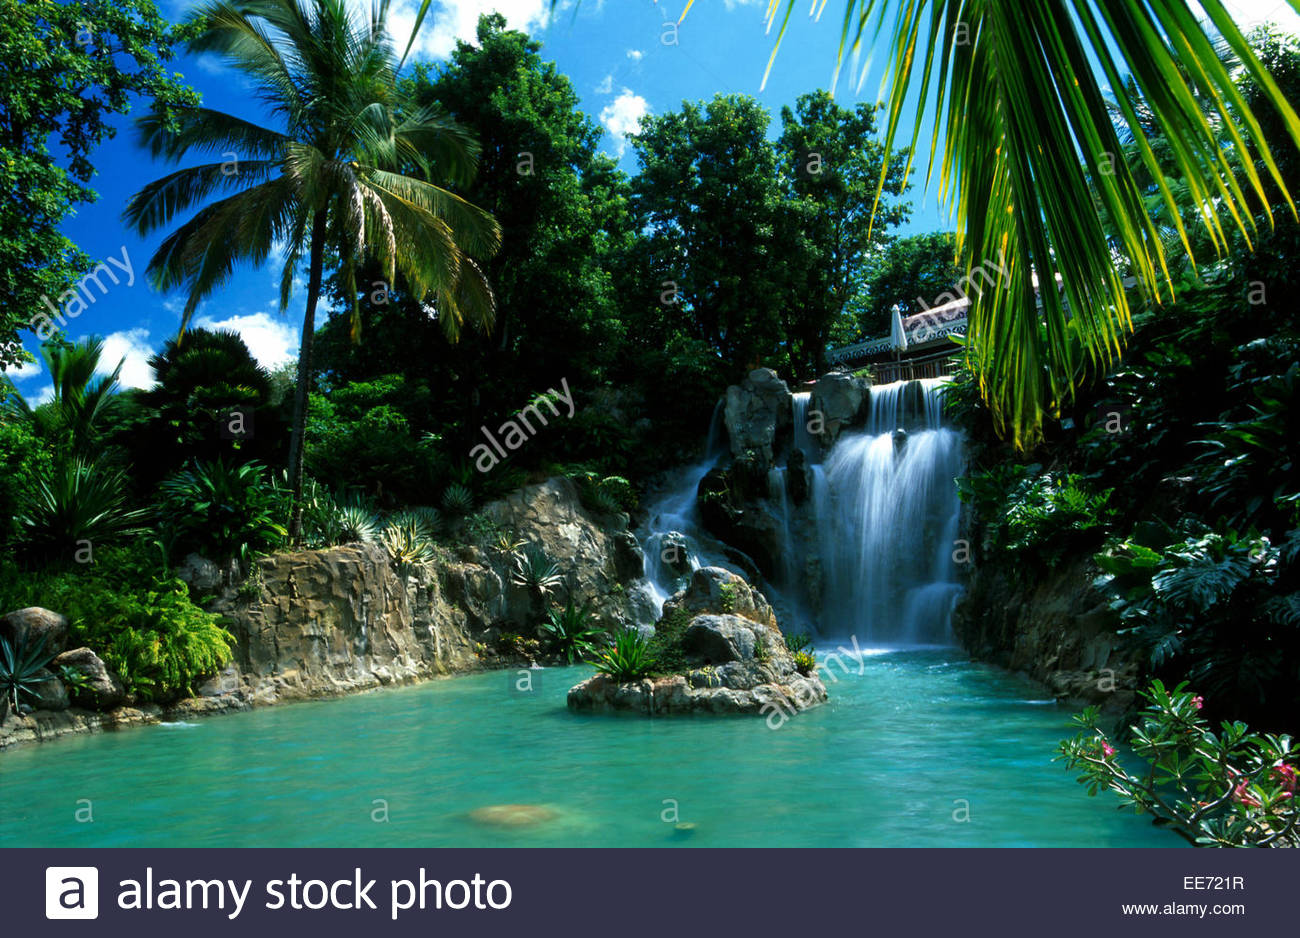 Guadeloupe basse terre botanical garden of deshaies - Jardin botanique guadeloupe basse terre ...